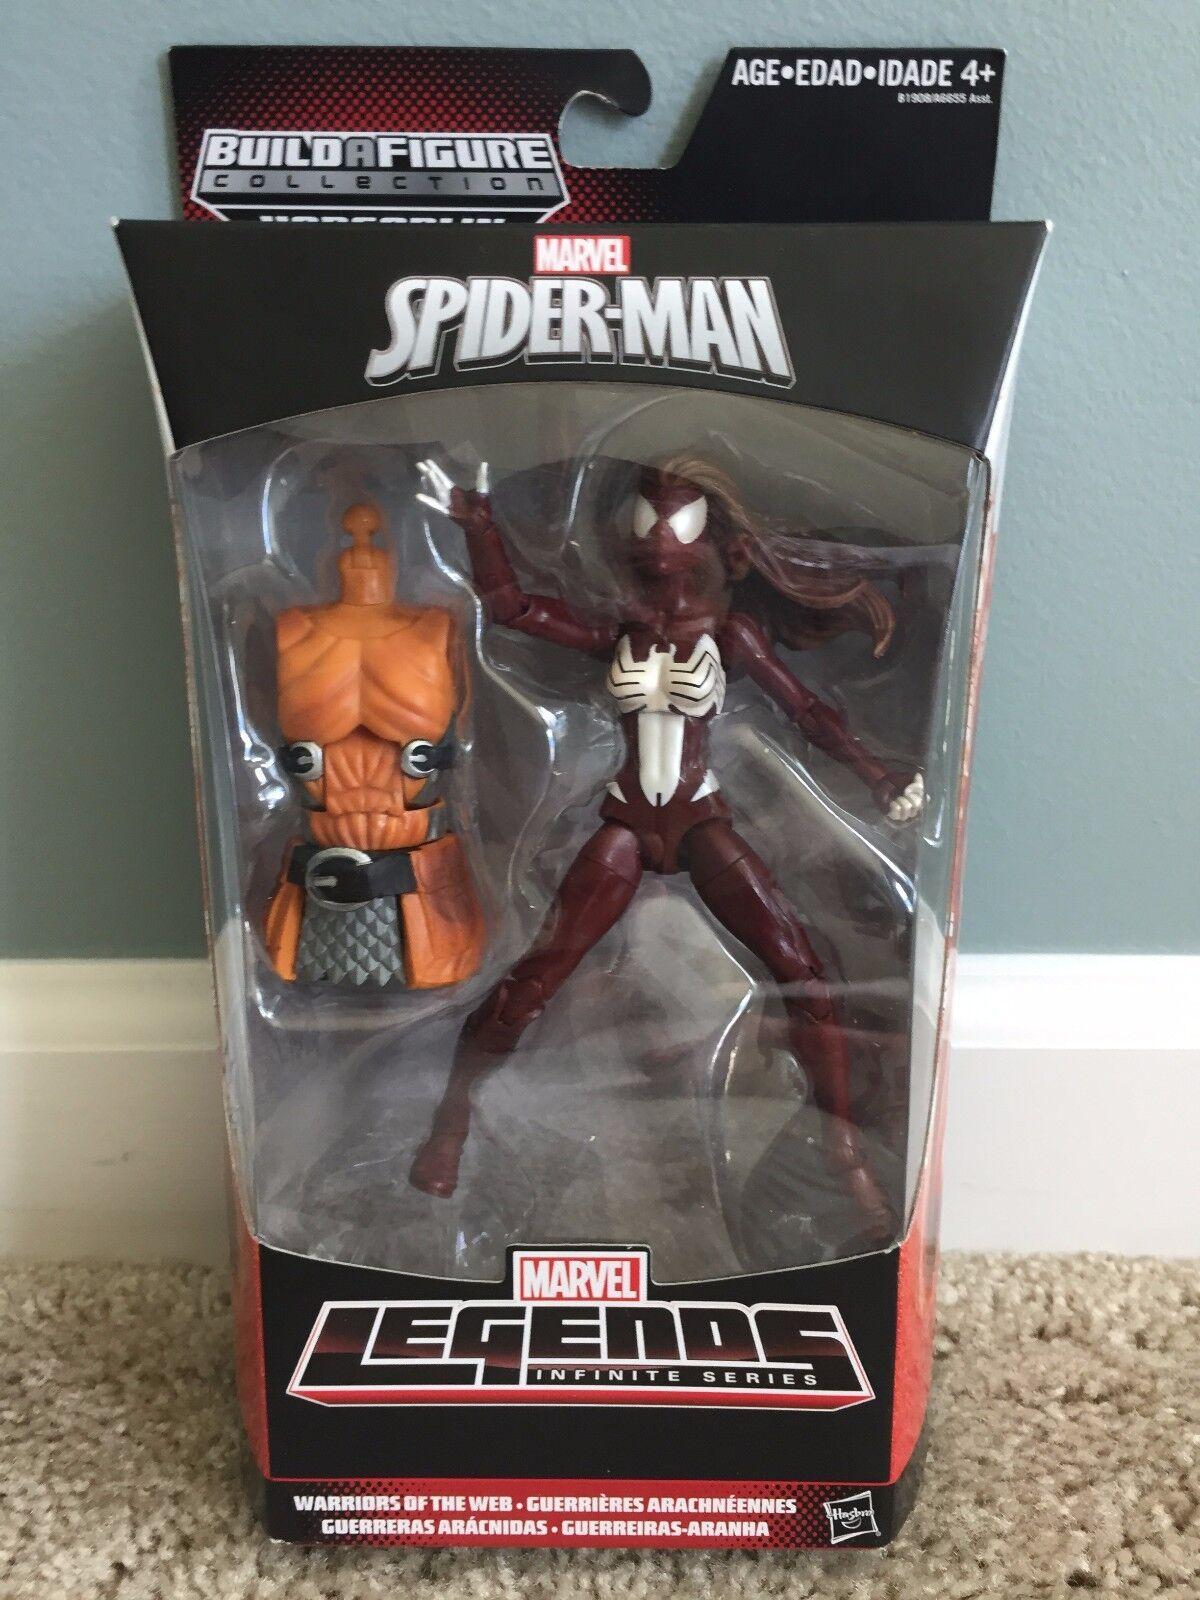 Marvel Legends Infinite Hobgoblin Series Ultmate Spider-Woman Cheap Intl Intl Intl Ship 9a8156